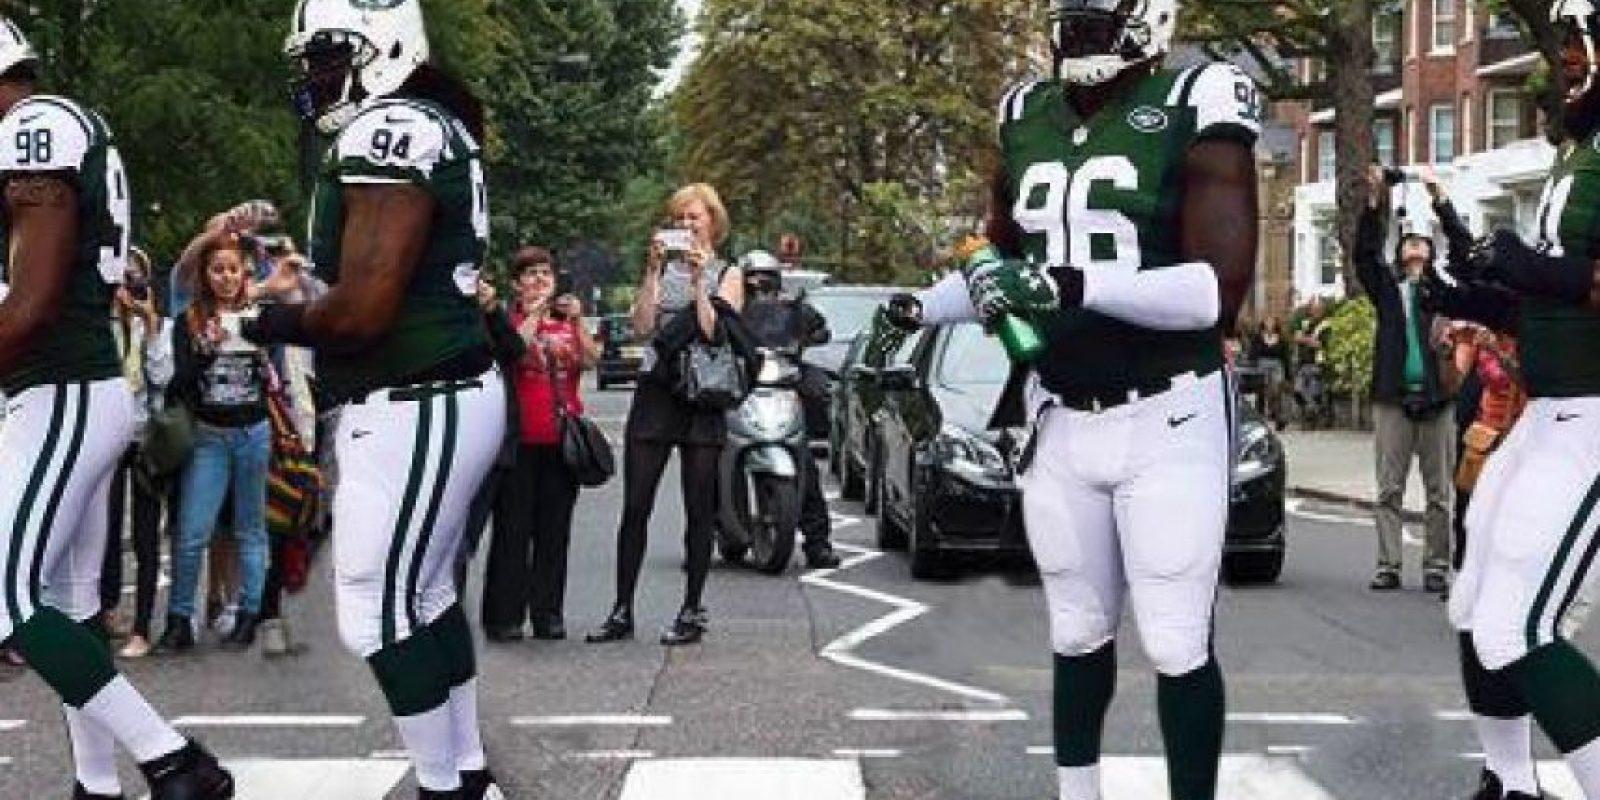 Abbey Road al estilo del fútbol americano Foto:Twitter